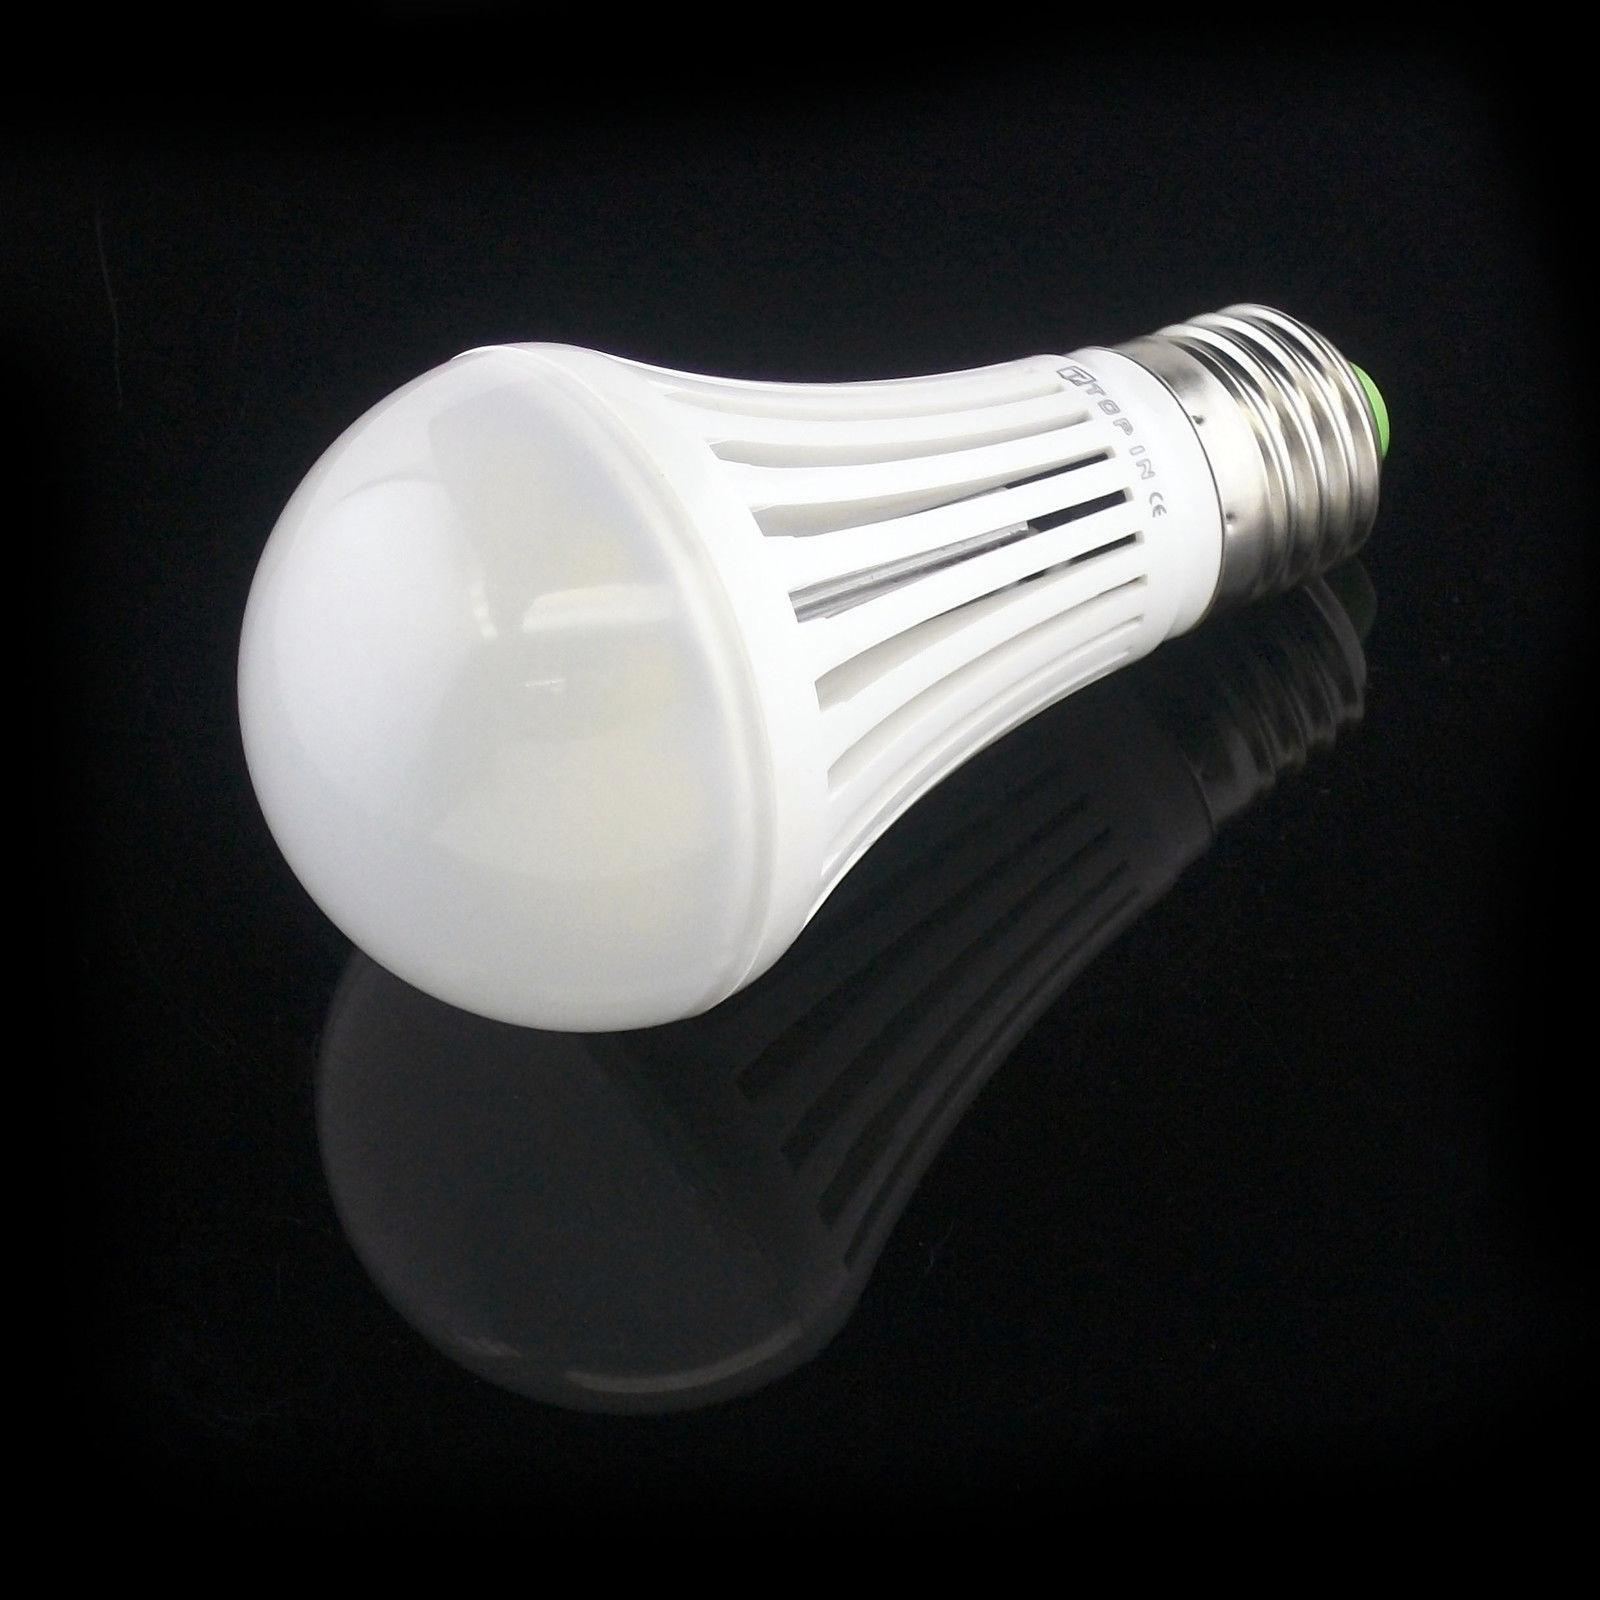 energy saving bright light led bulb lamp for home use 7w. Black Bedroom Furniture Sets. Home Design Ideas